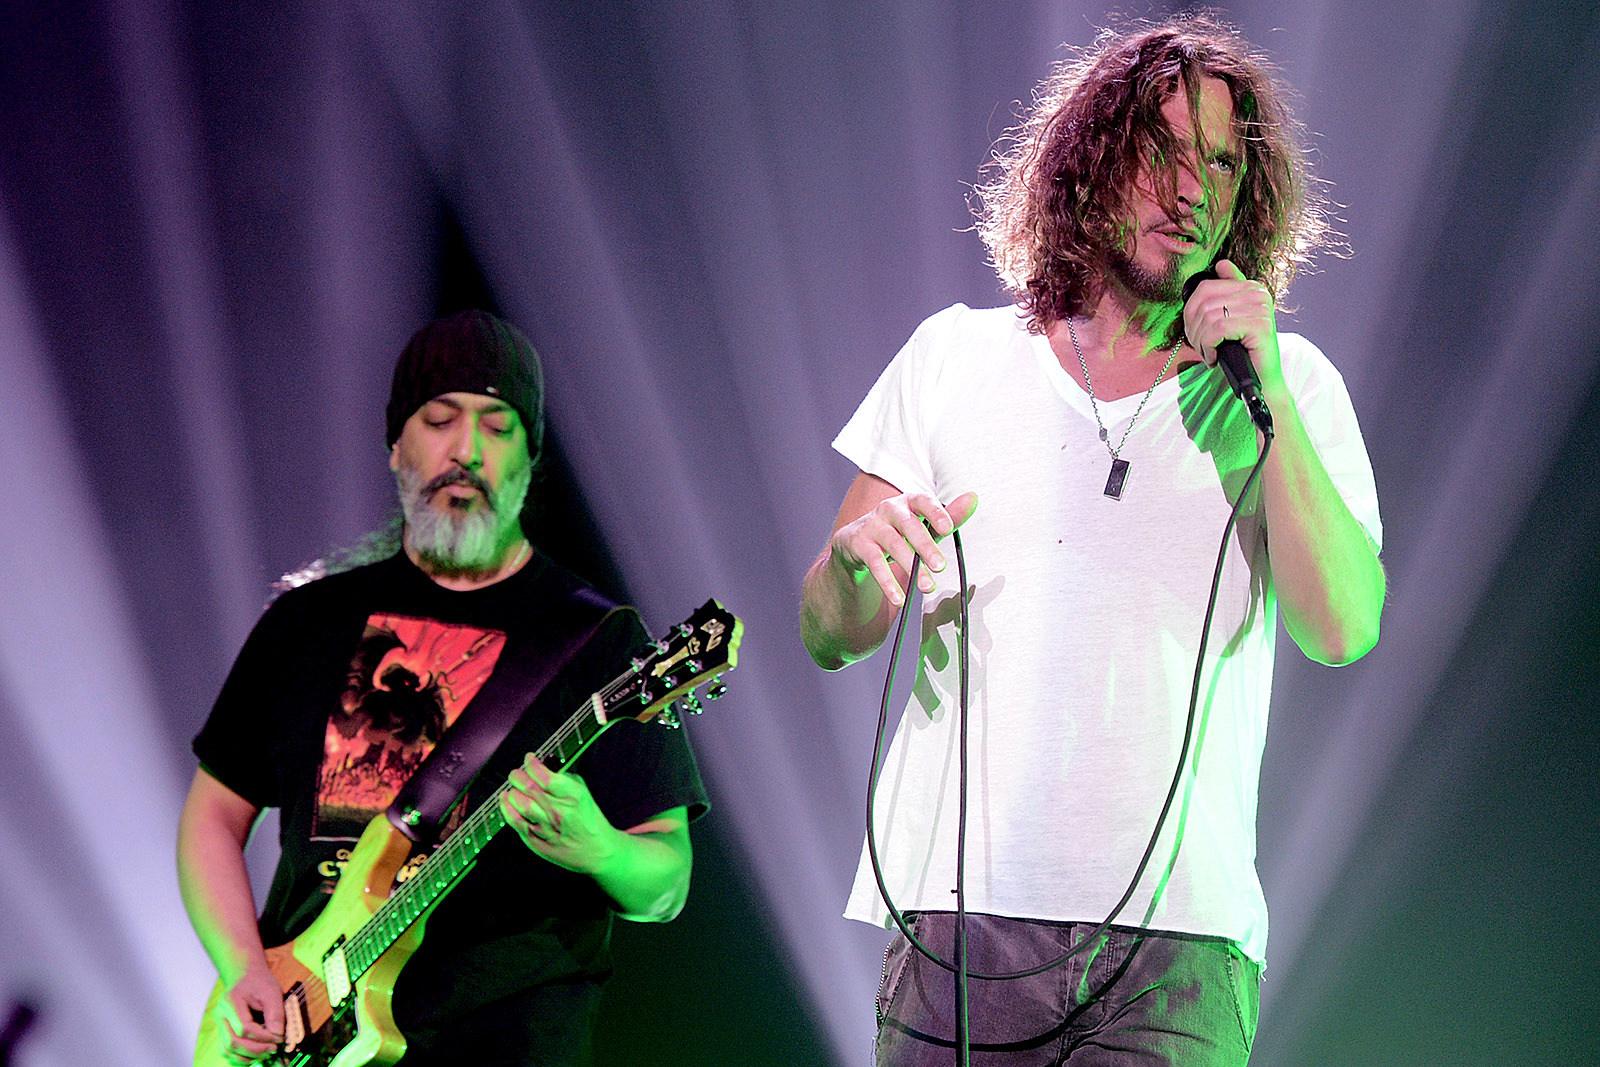 Leaving Last Soundgarden Album Unfinished Is 'Ridiculous' Says Kim Thayil